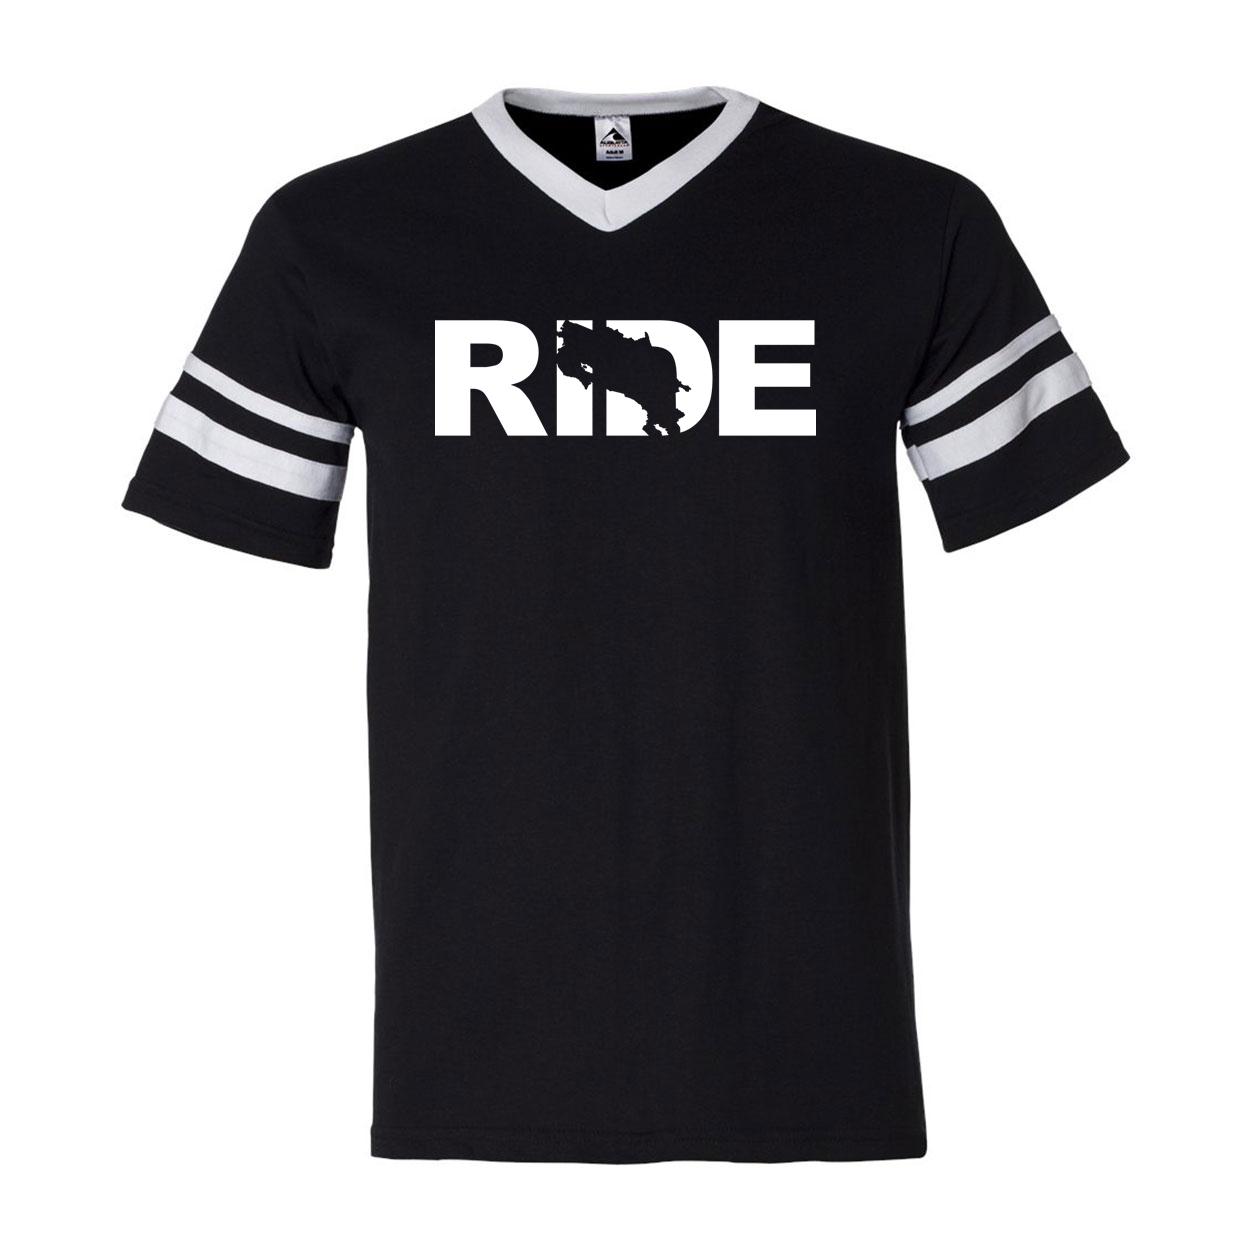 Ride Costa Rica Classic Premium Striped Jersey T-Shirt Black/White (White Logo)